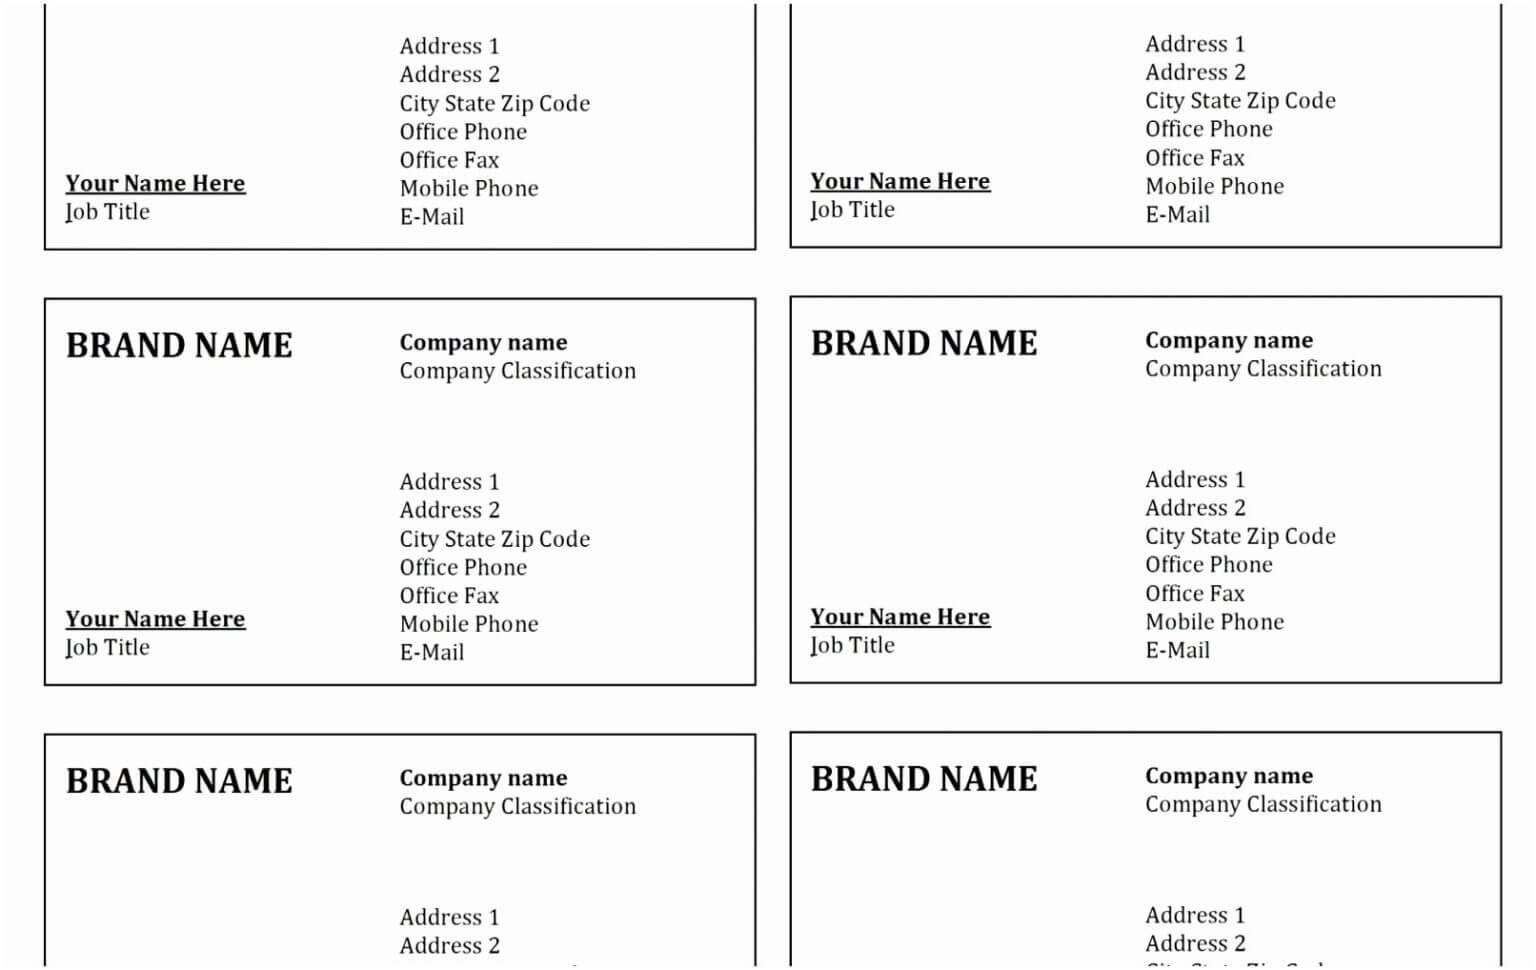 024 Staples Business Card Template Ideas Beautiful With Staples Business Card Template